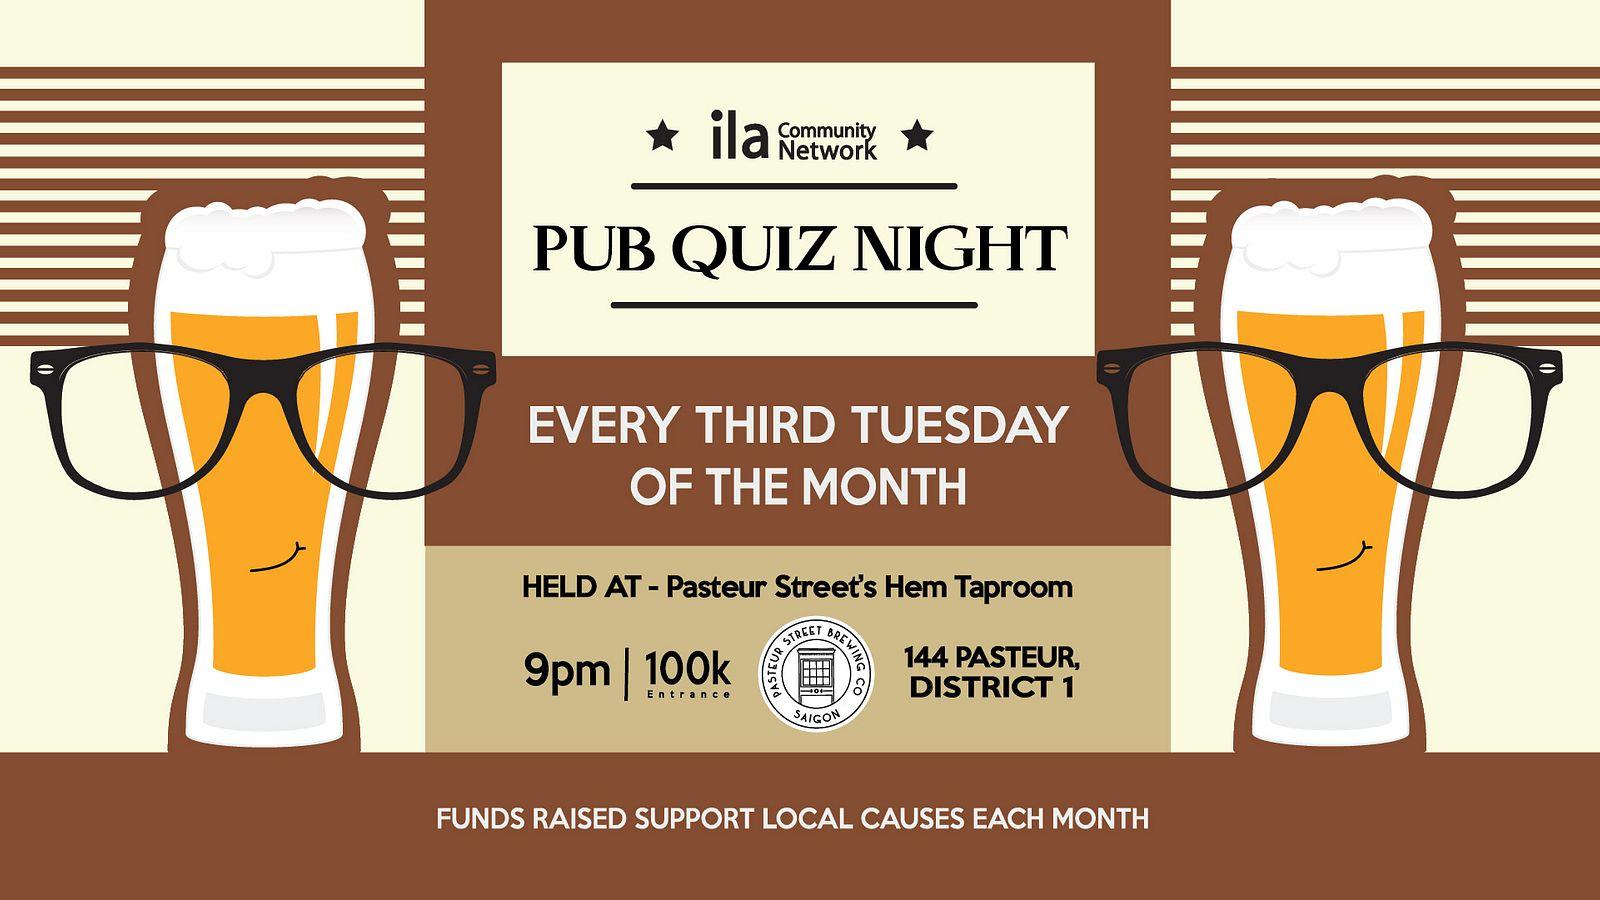 ILACN Charity Pub Quiz @ Pasteur Street - Saigoneer